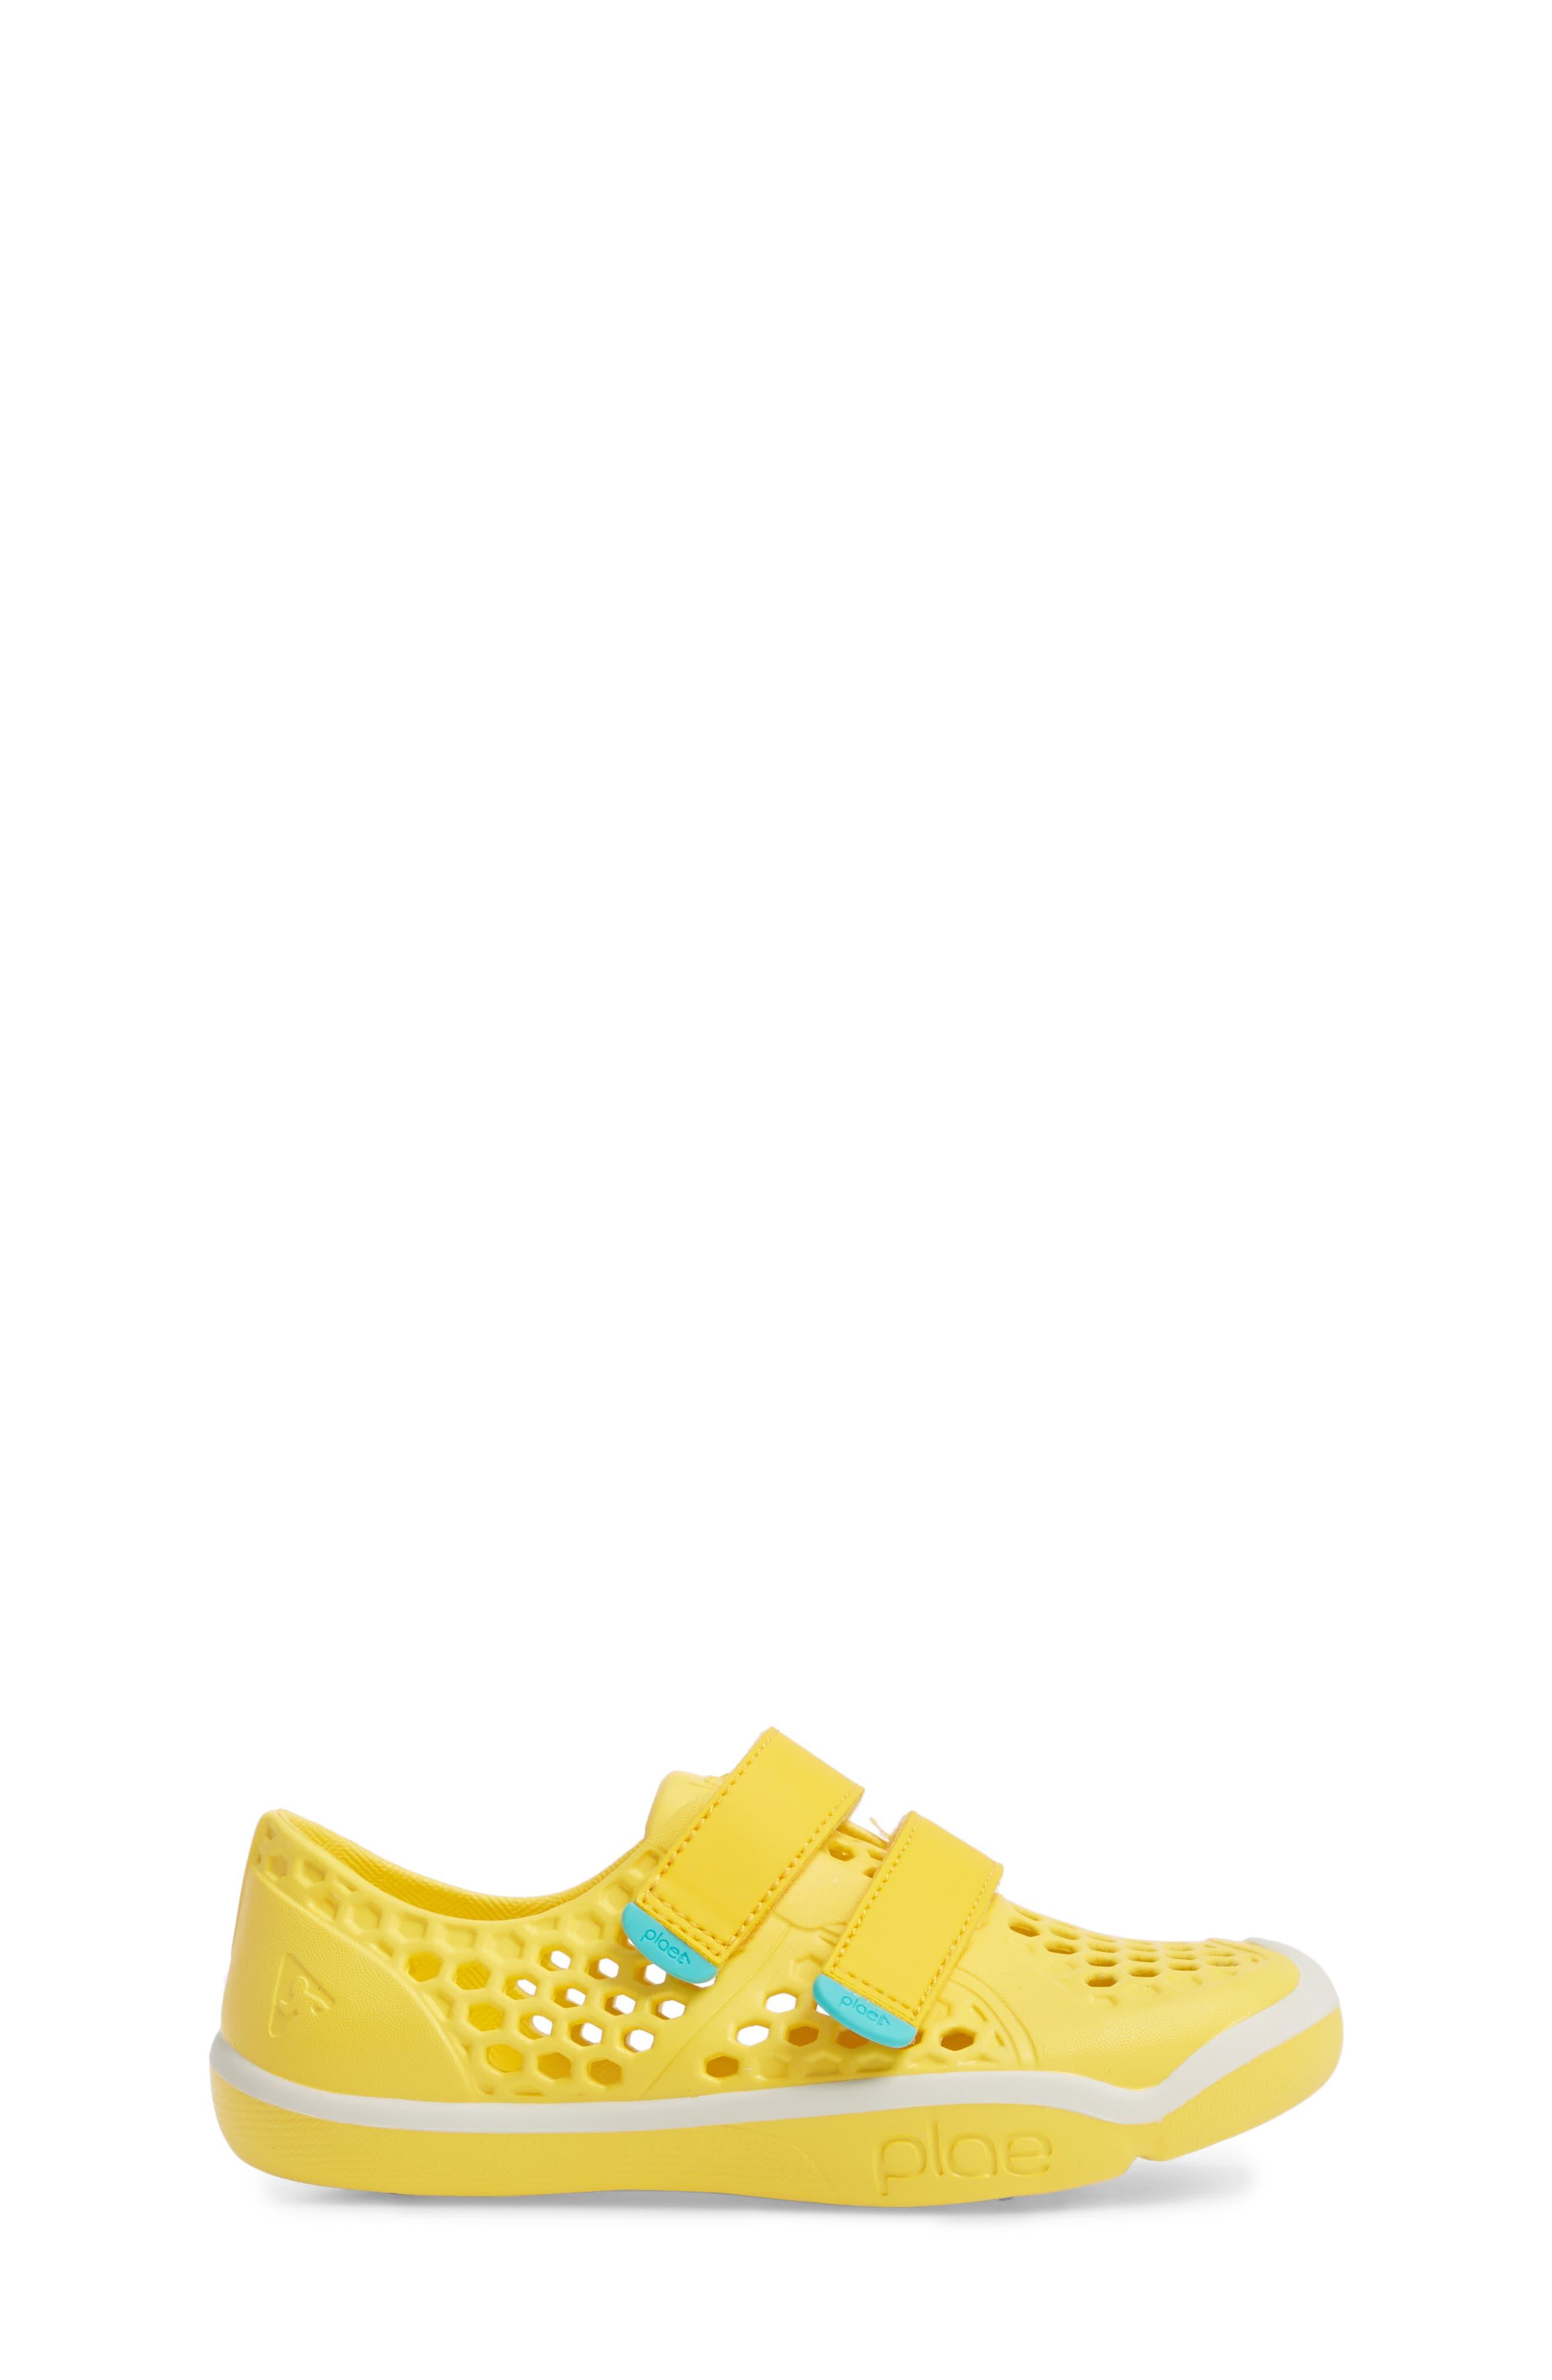 Mimo Customizable Sneaker,                             Alternate thumbnail 3, color,                             Dandelion